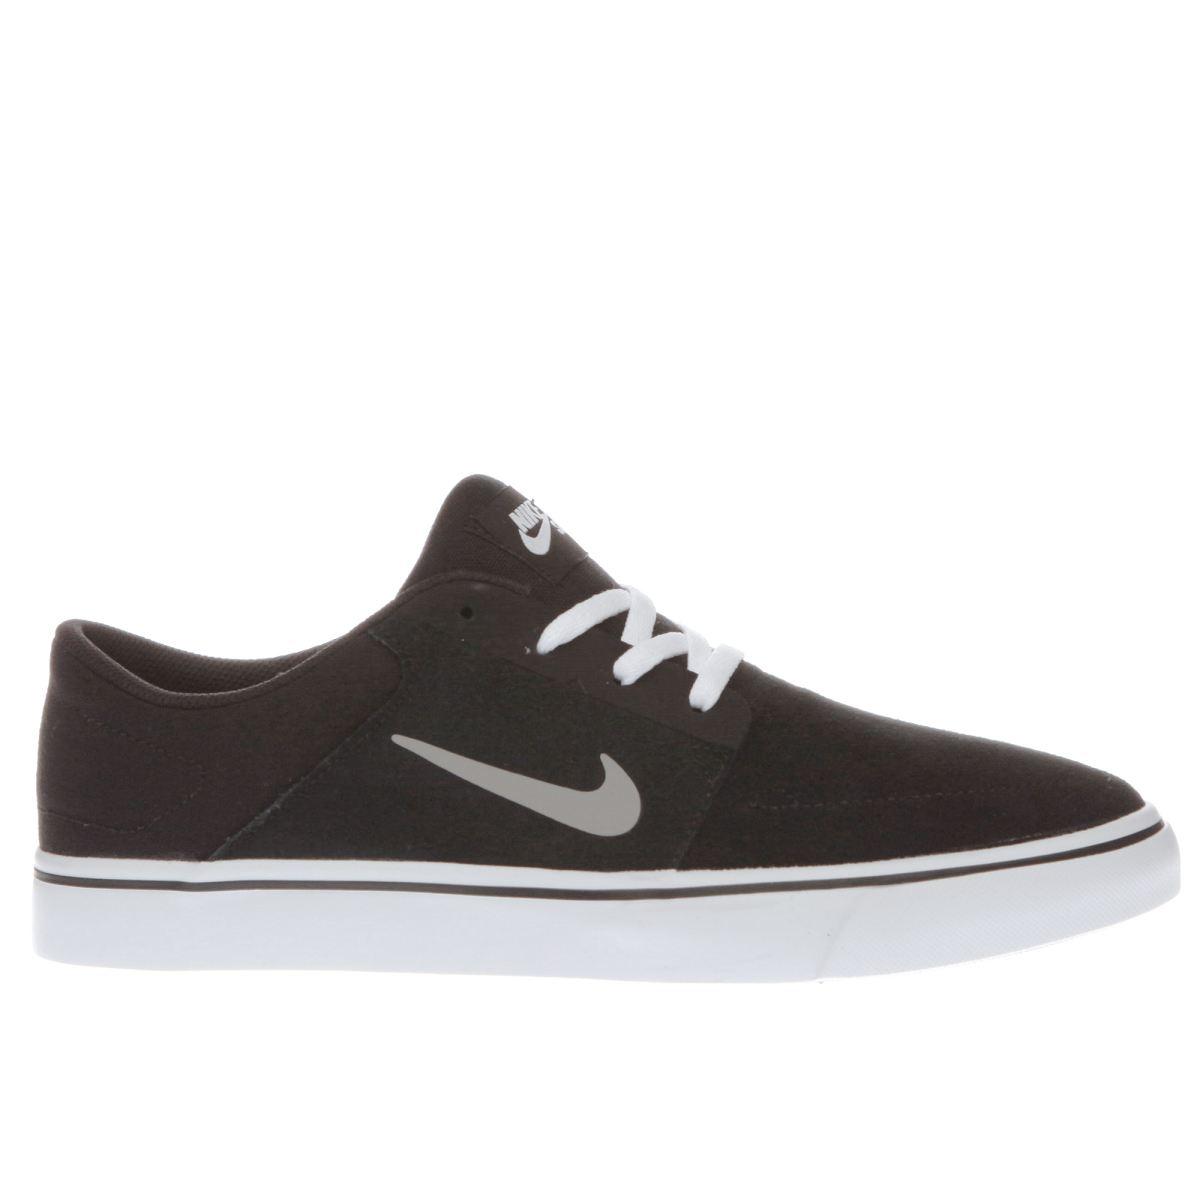 nike sb black & grey portmore trainers